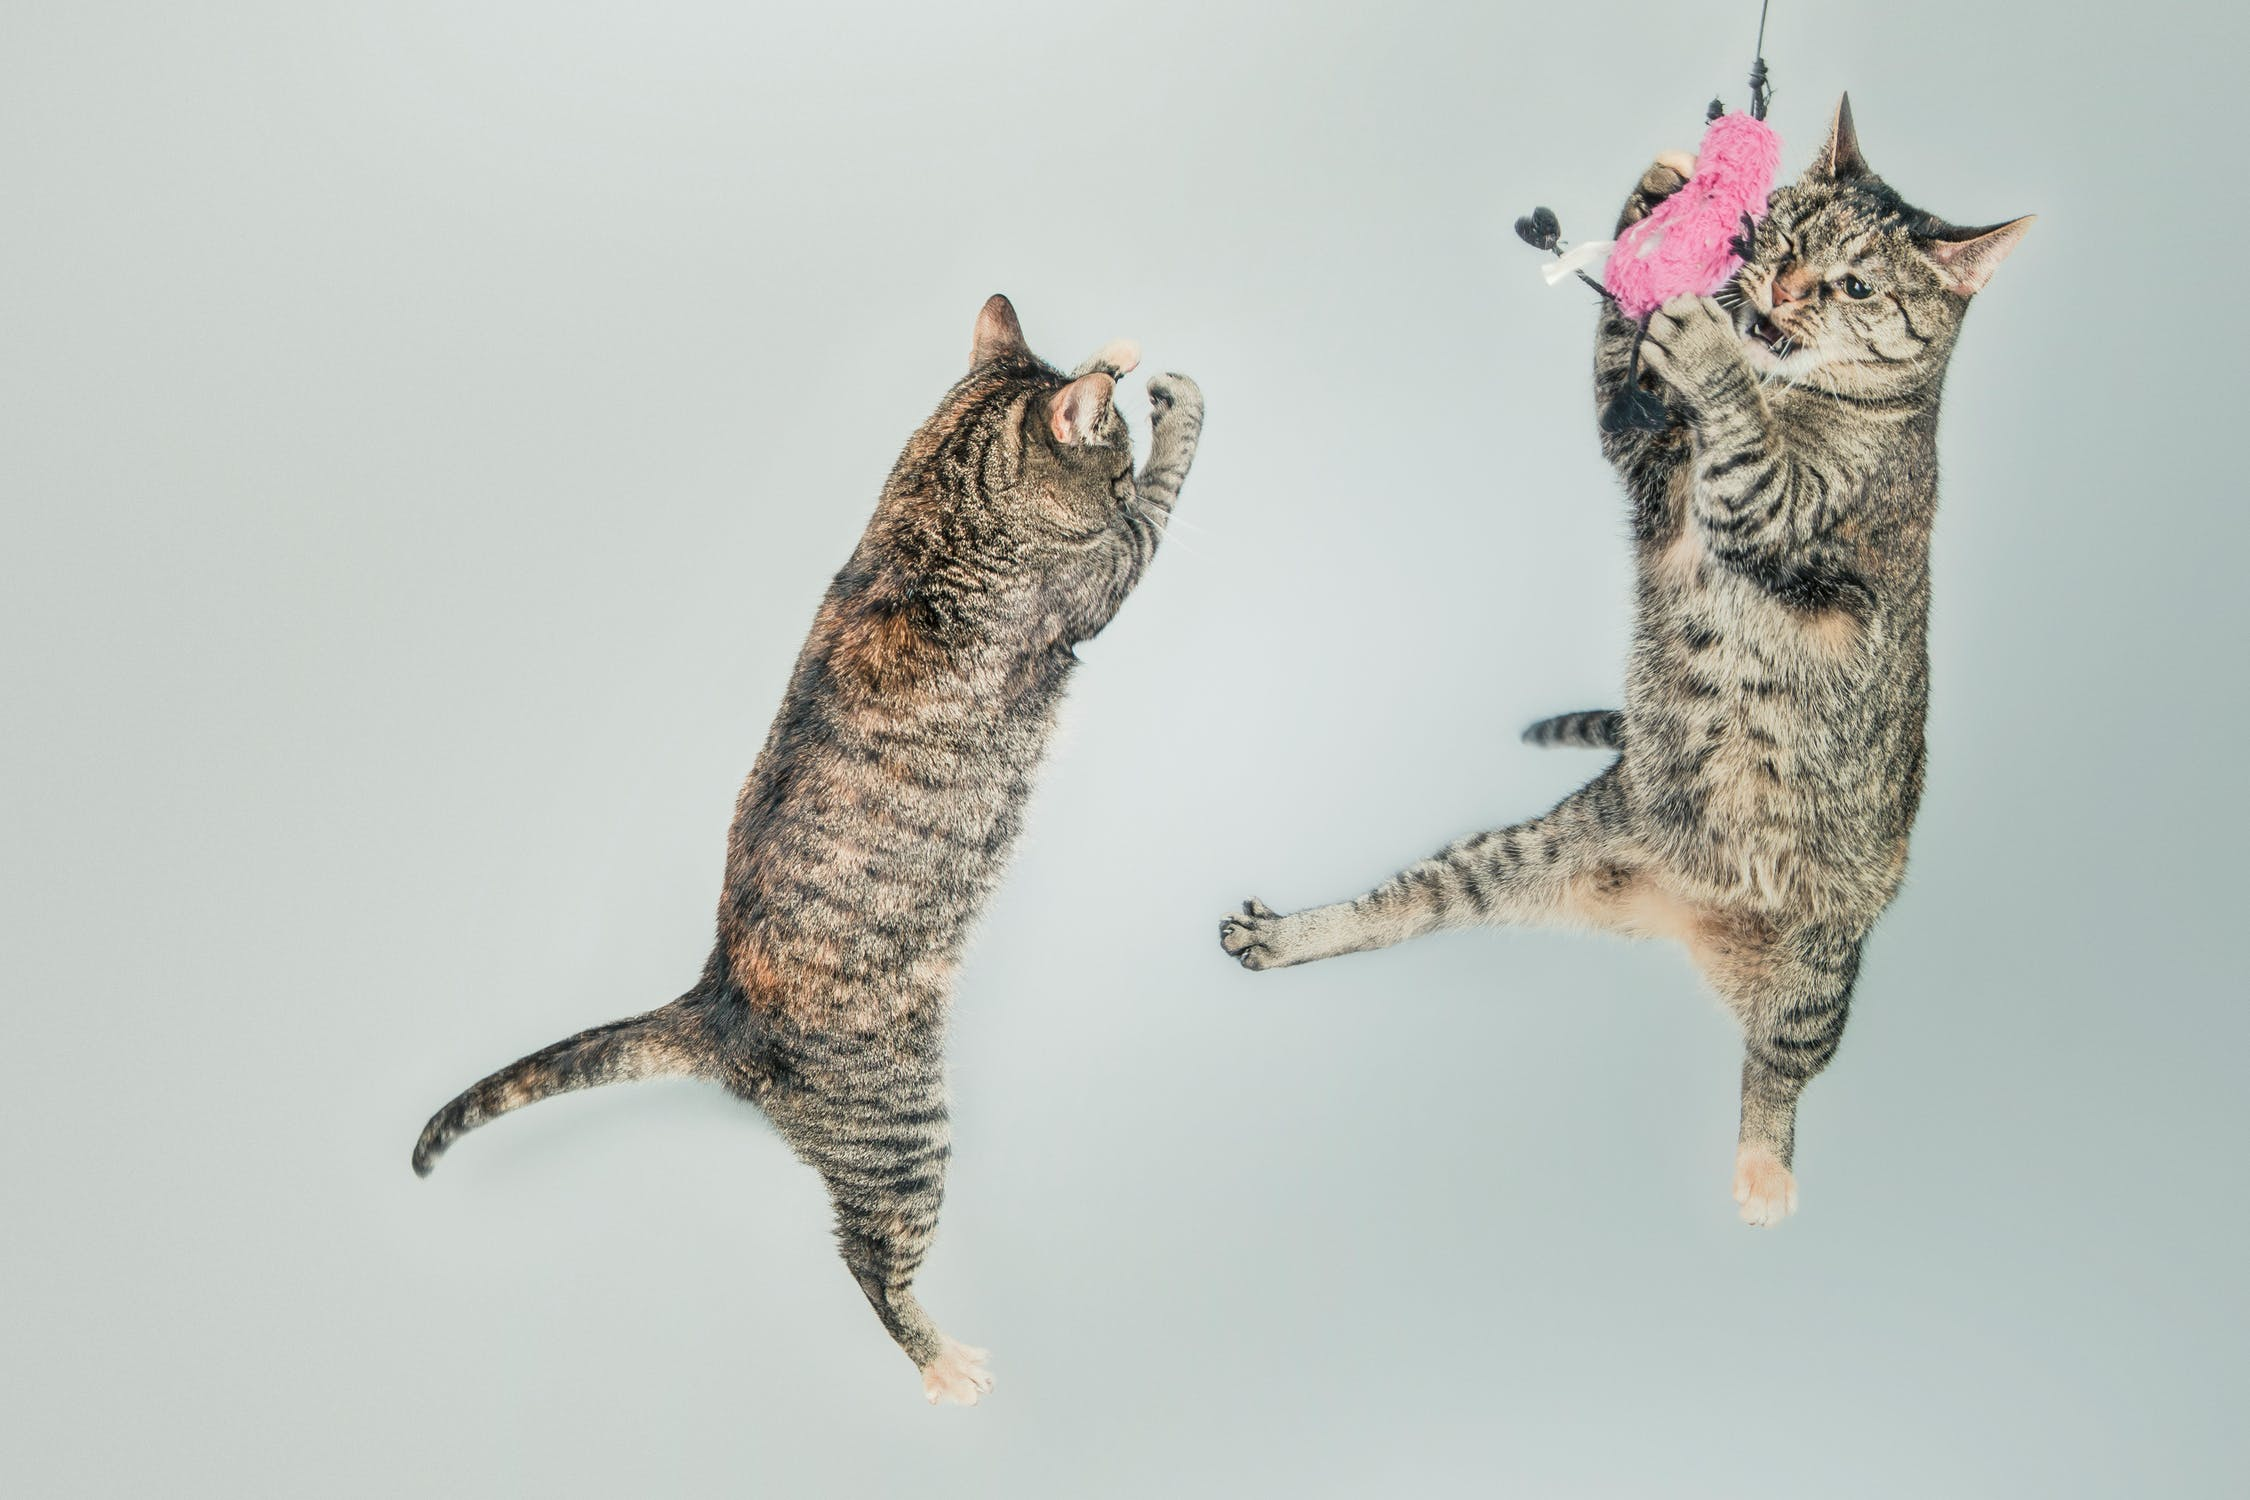 https://images.pexels.com/photos/4602/jumping-cute-playing-animals.jpg?auto=compress&cs=tinysrgb&dpr=2&h=750&w=1260